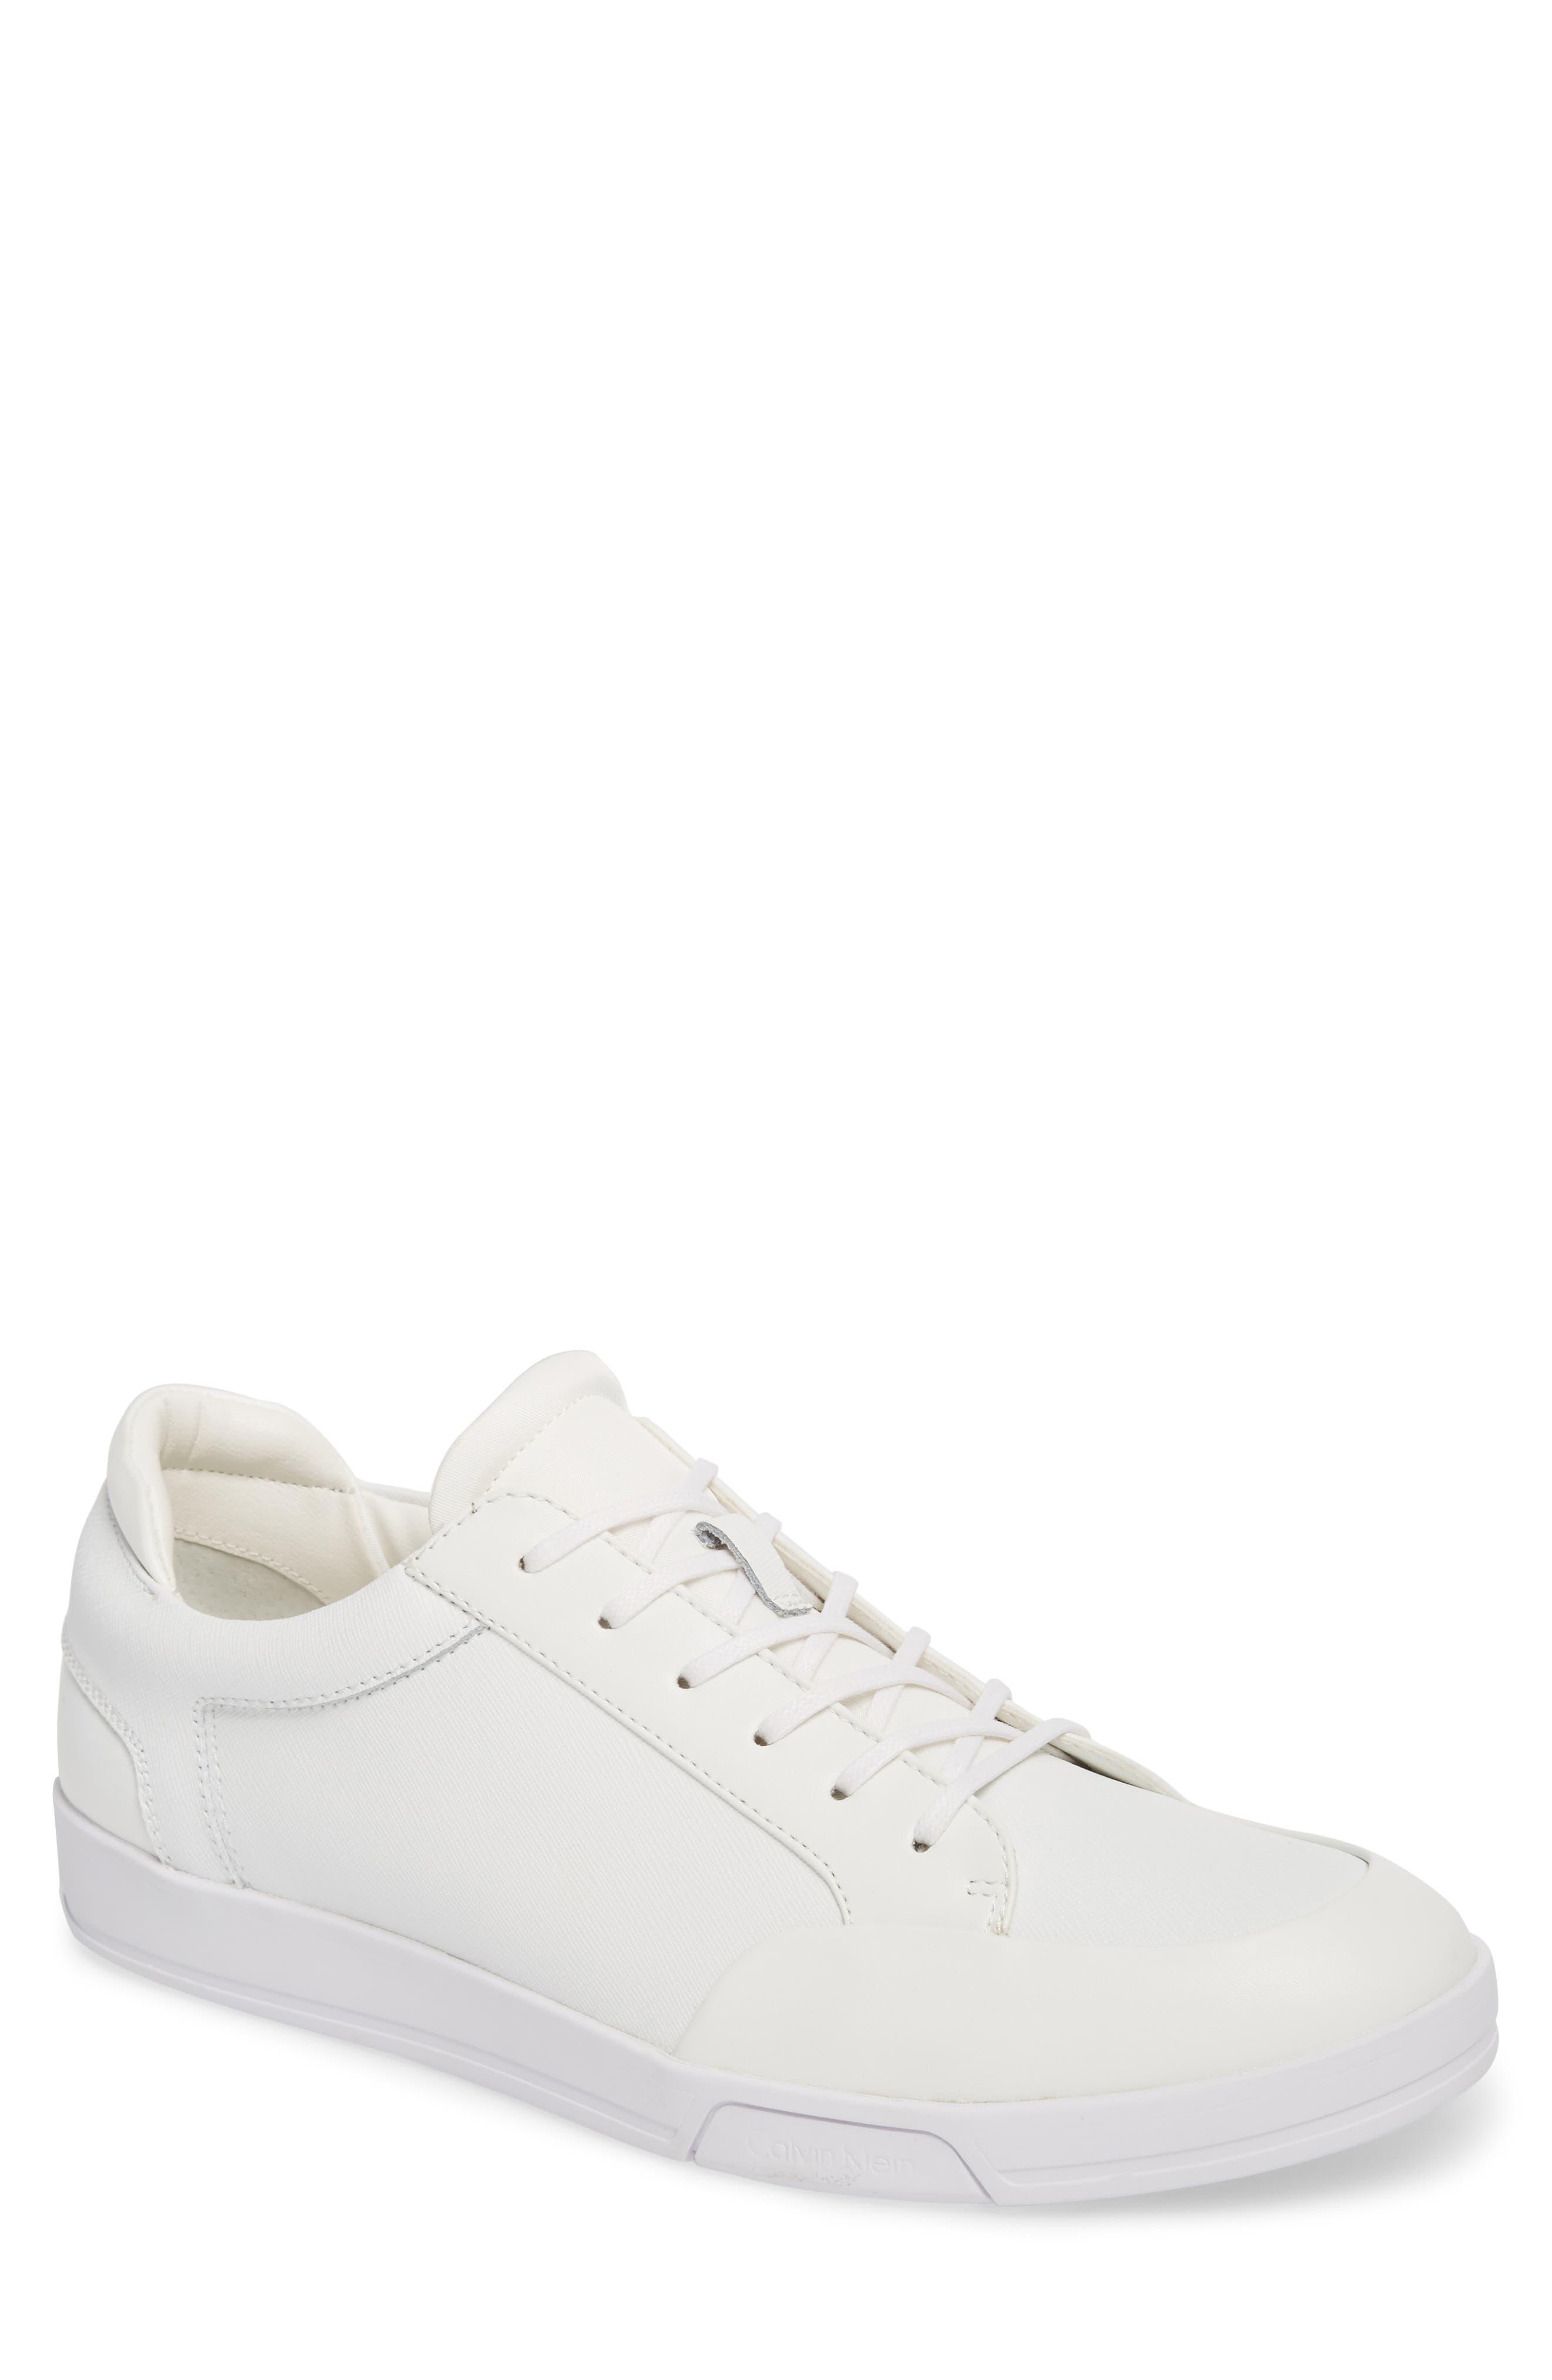 Alternate Image 1 Selected - Calvin Klein Baldwin Sneaker (Men)